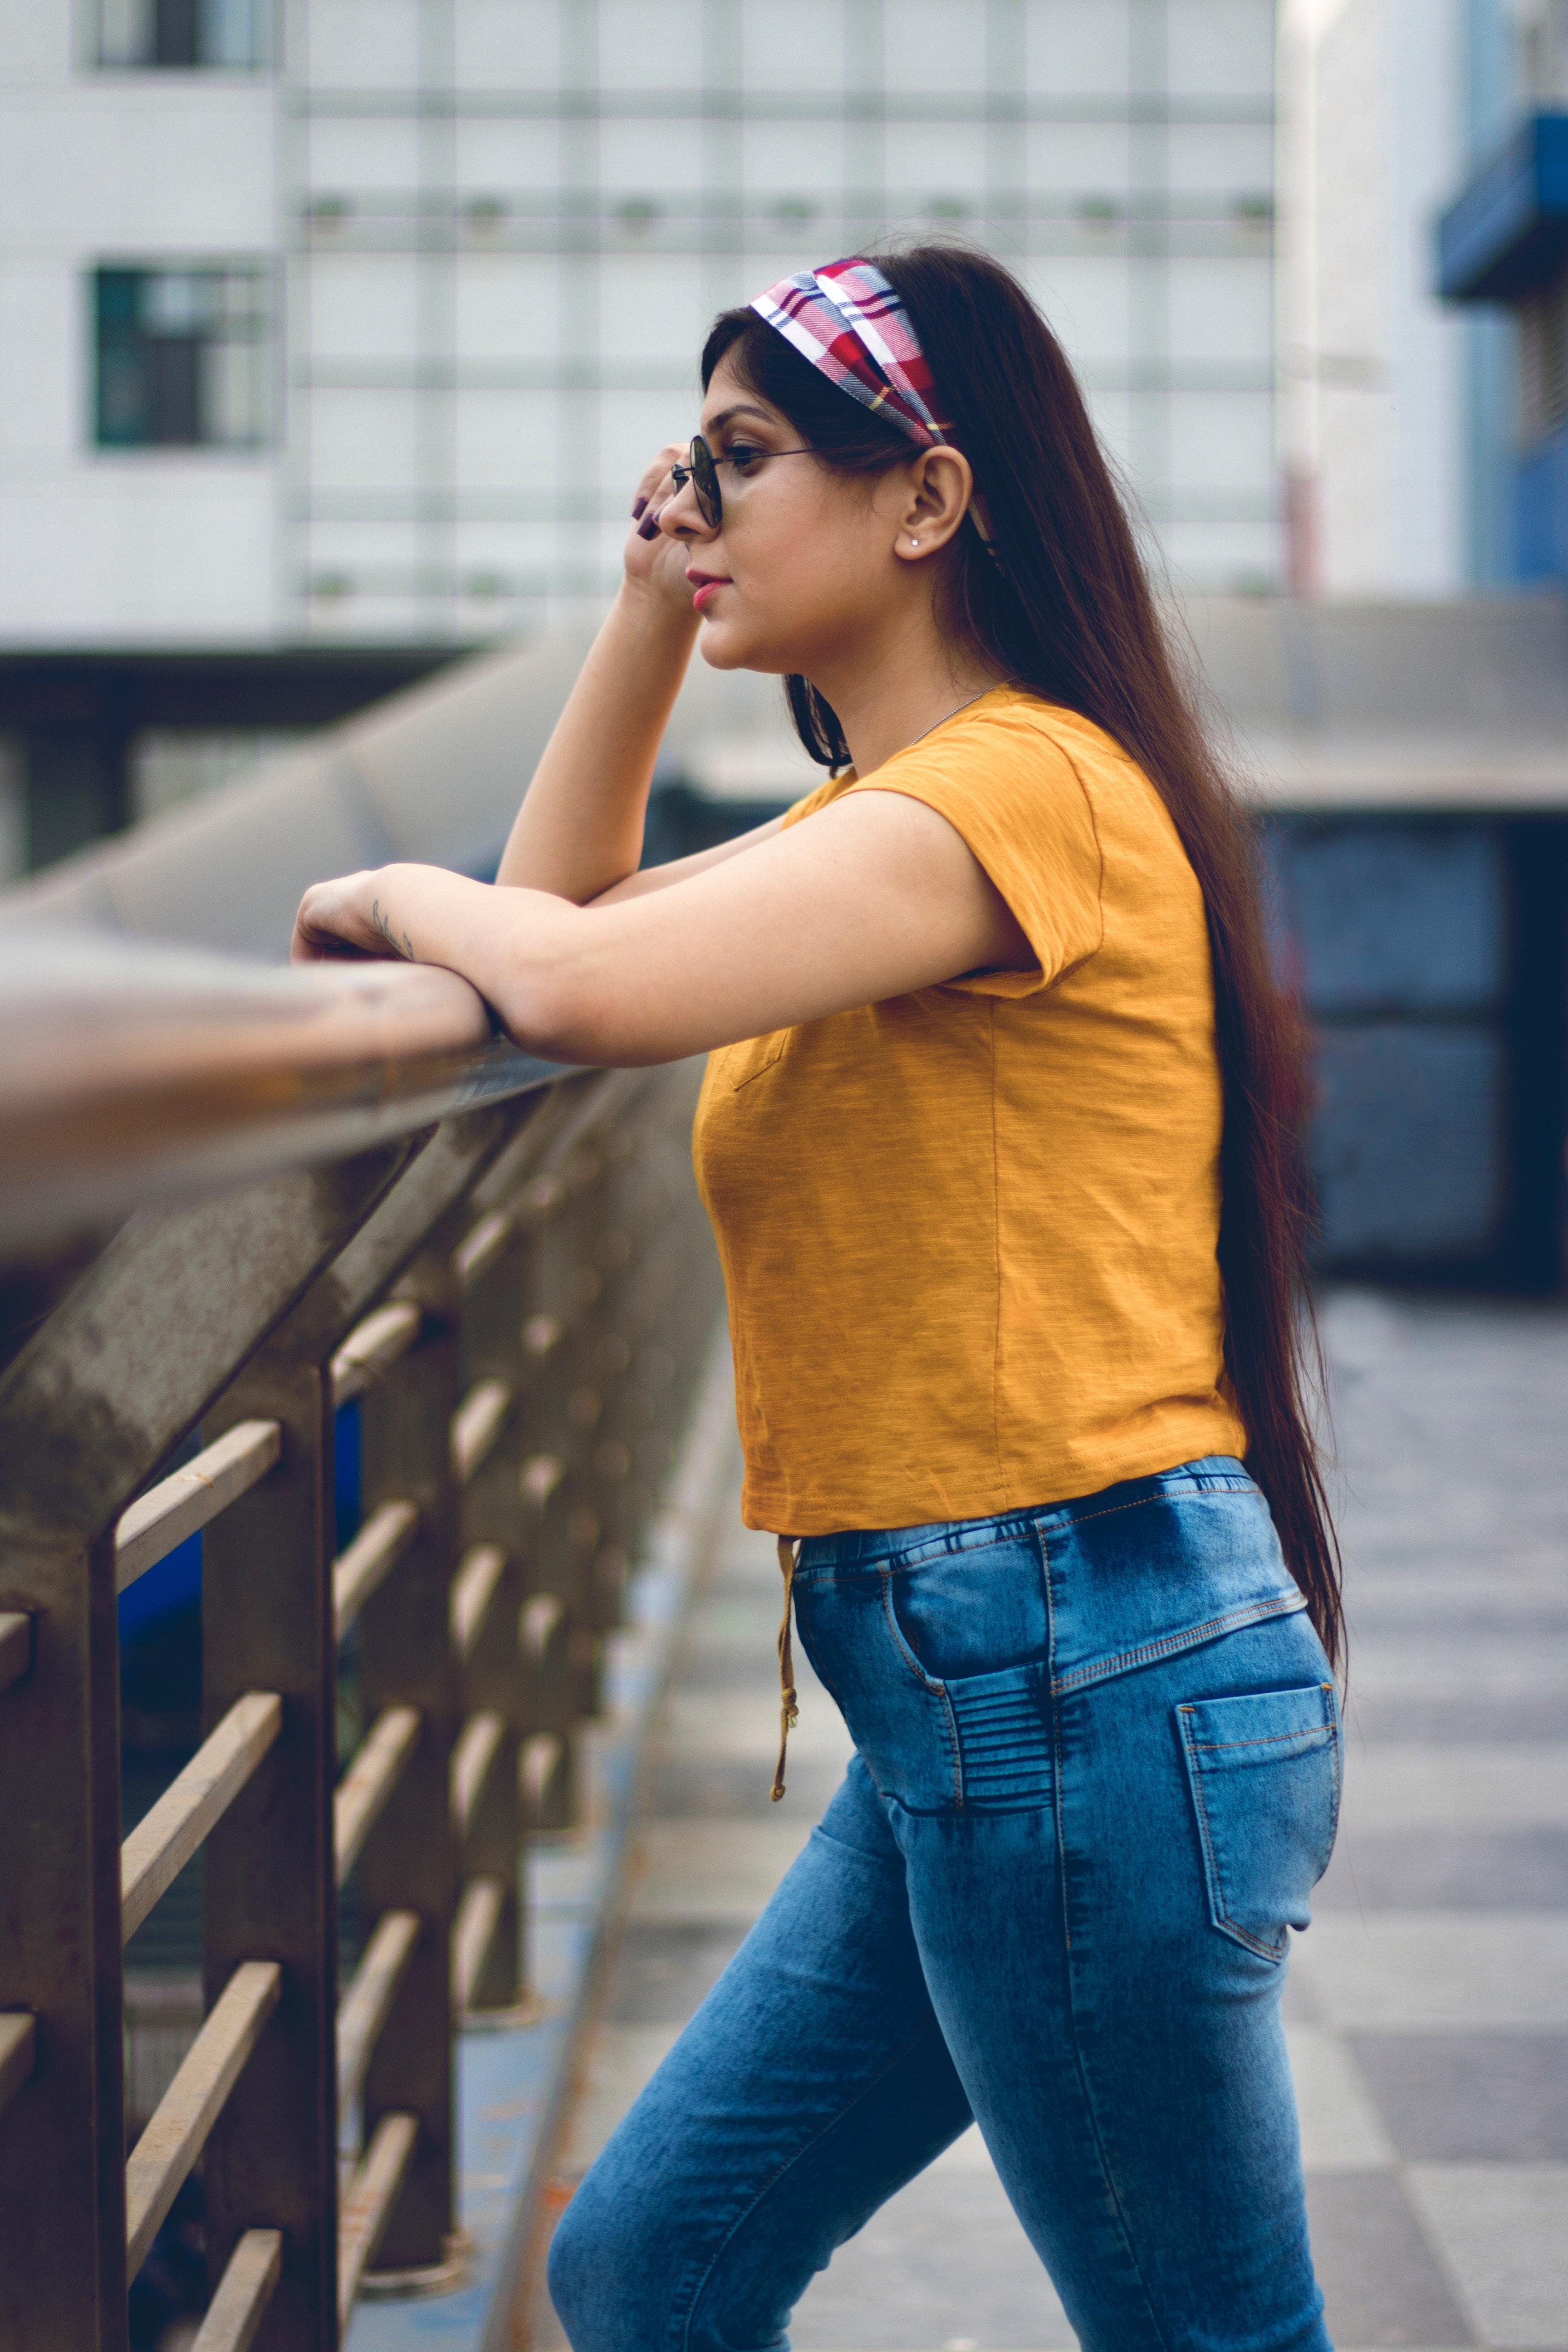 Free Images  adolescent, fashion model, fashion photography